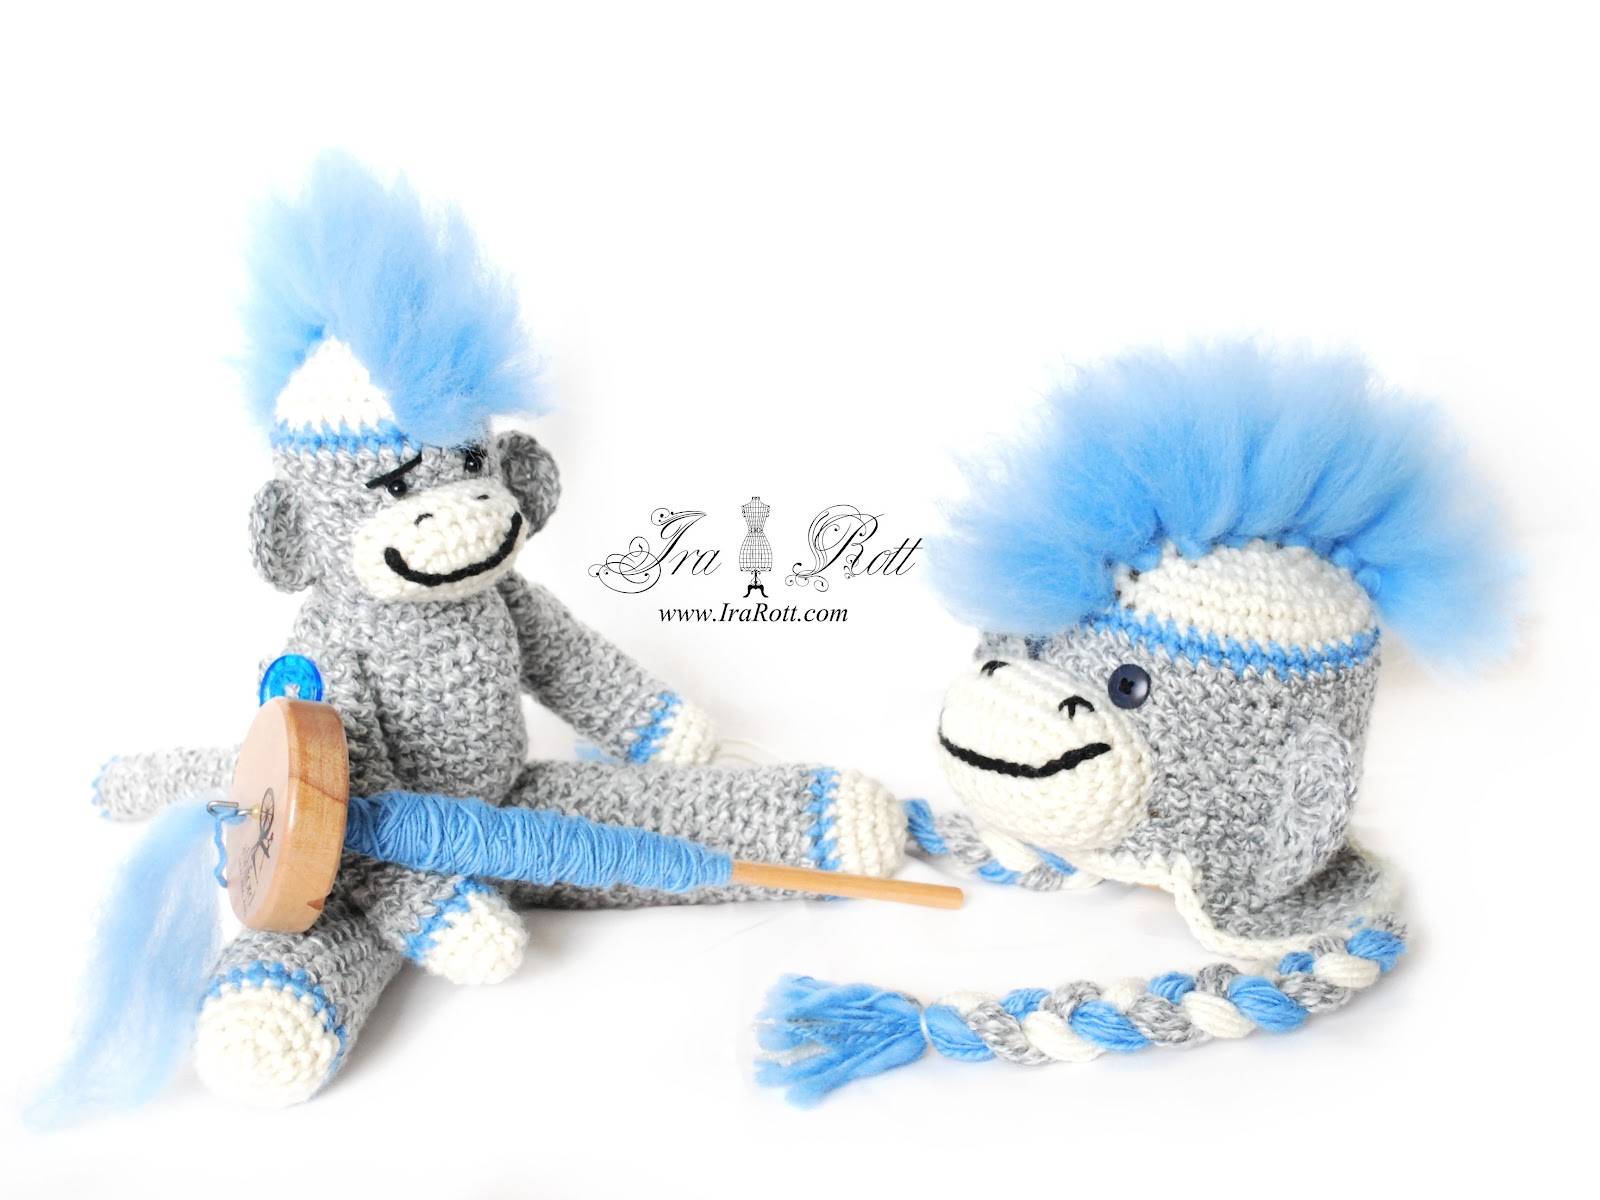 Handmade Hats Crochet Patterns By Irarott Inc Handmade